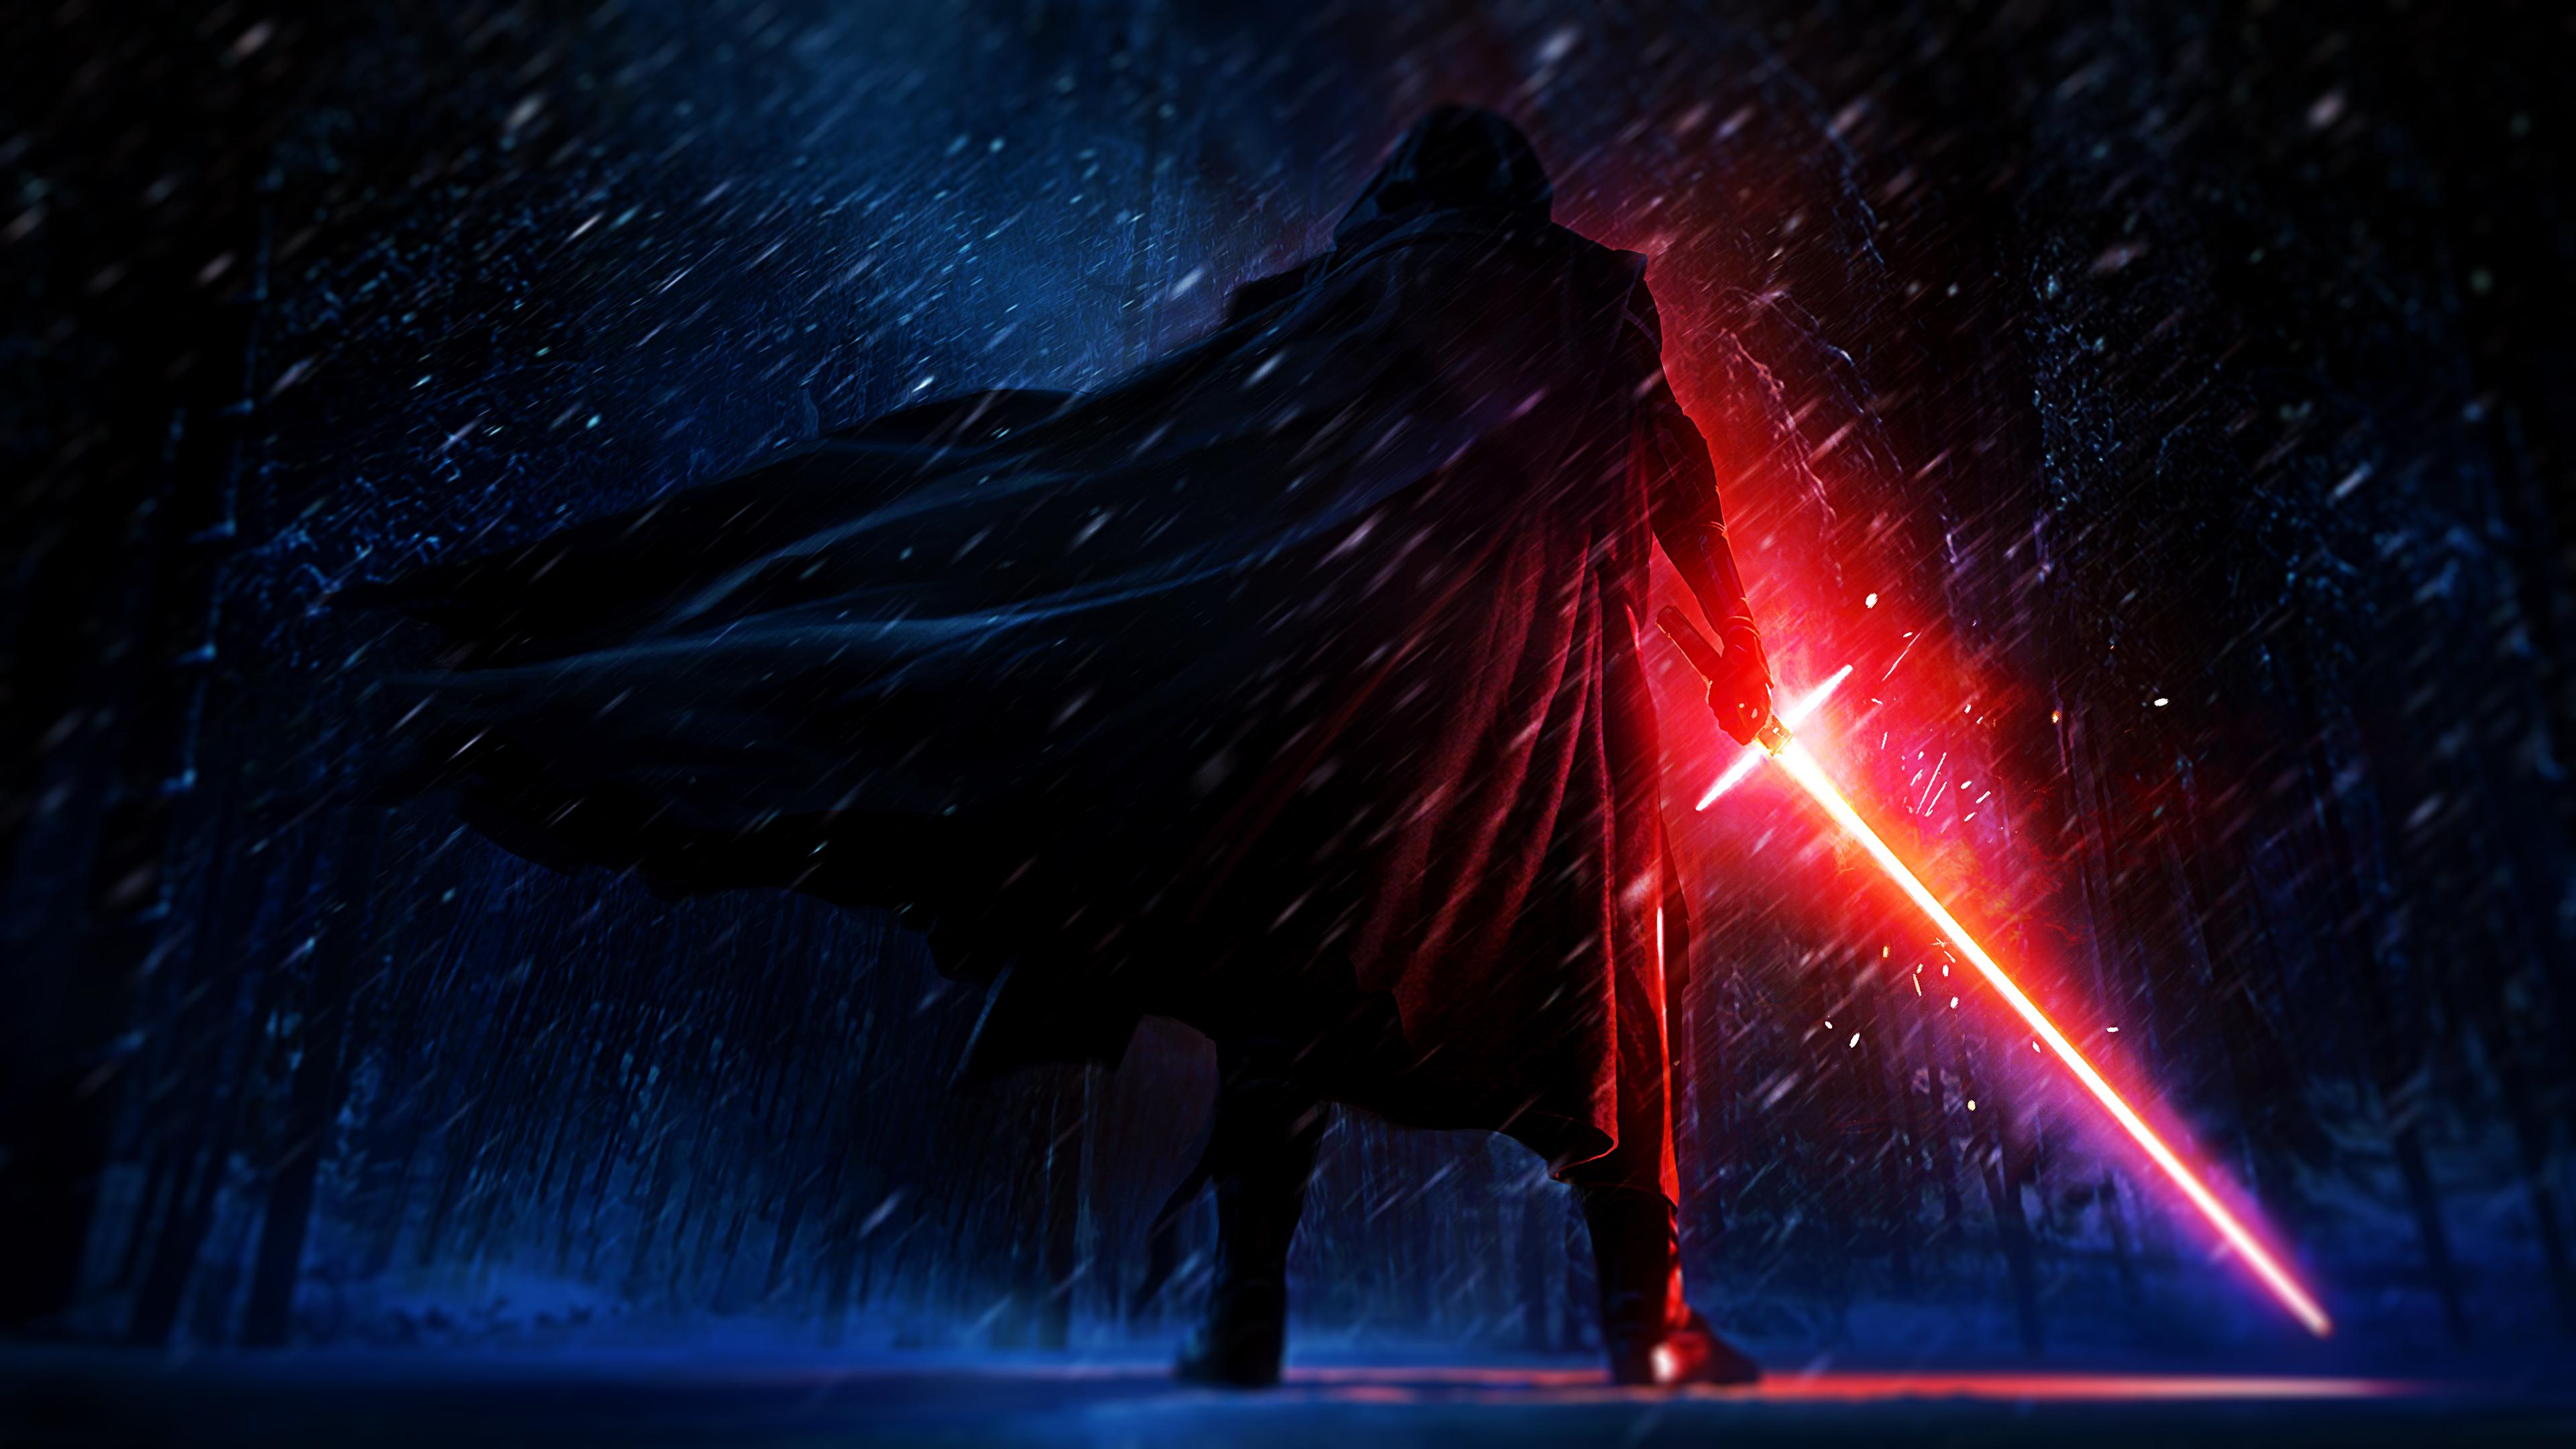 Star Wars Kylo Ren Wallpaper - WallpaperSafari